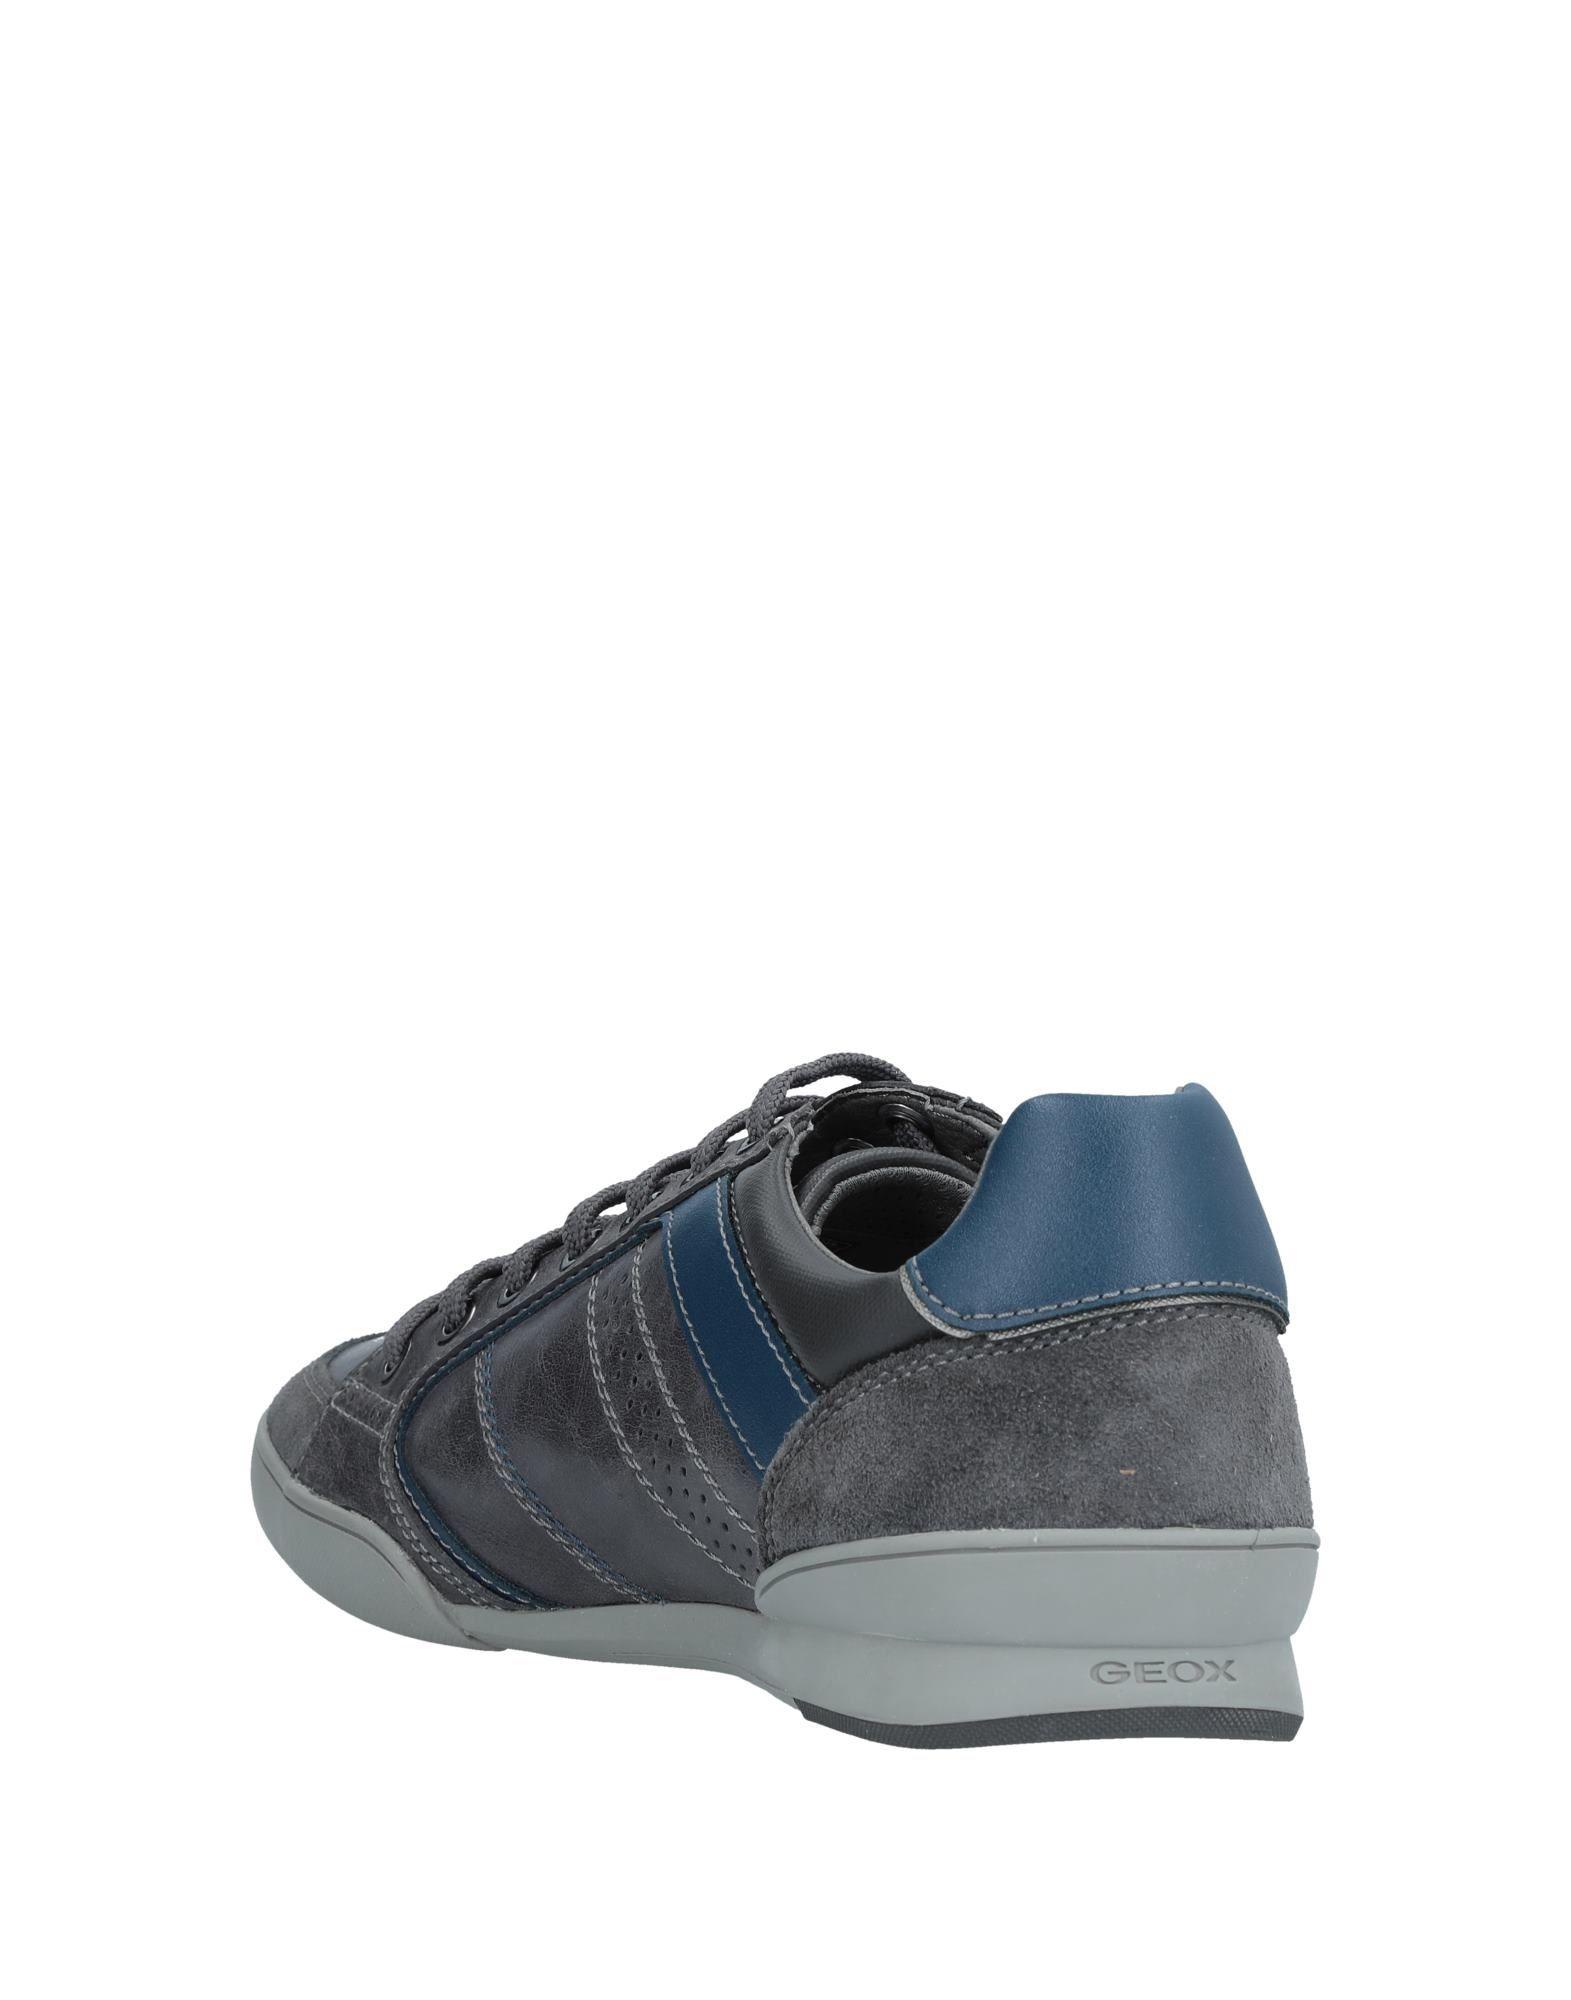 Geox Sneakers Herren beliebte  11217717ES Gute Qualität beliebte Herren Schuhe 01bdf8